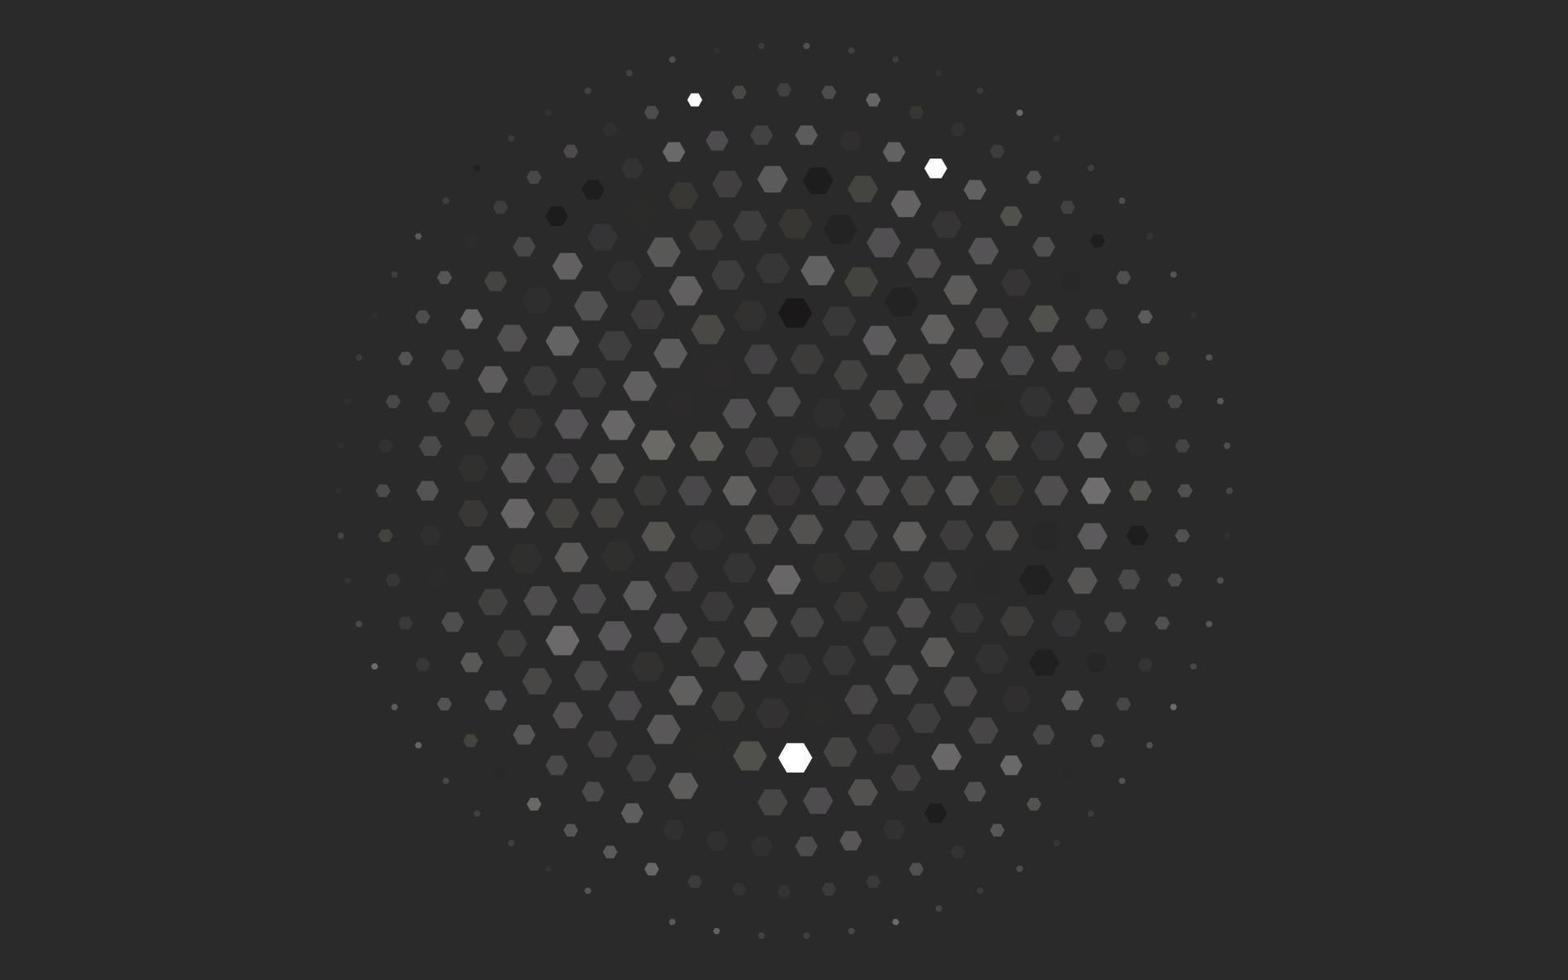 textura de vetor preto claro com hexágonos coloridos.